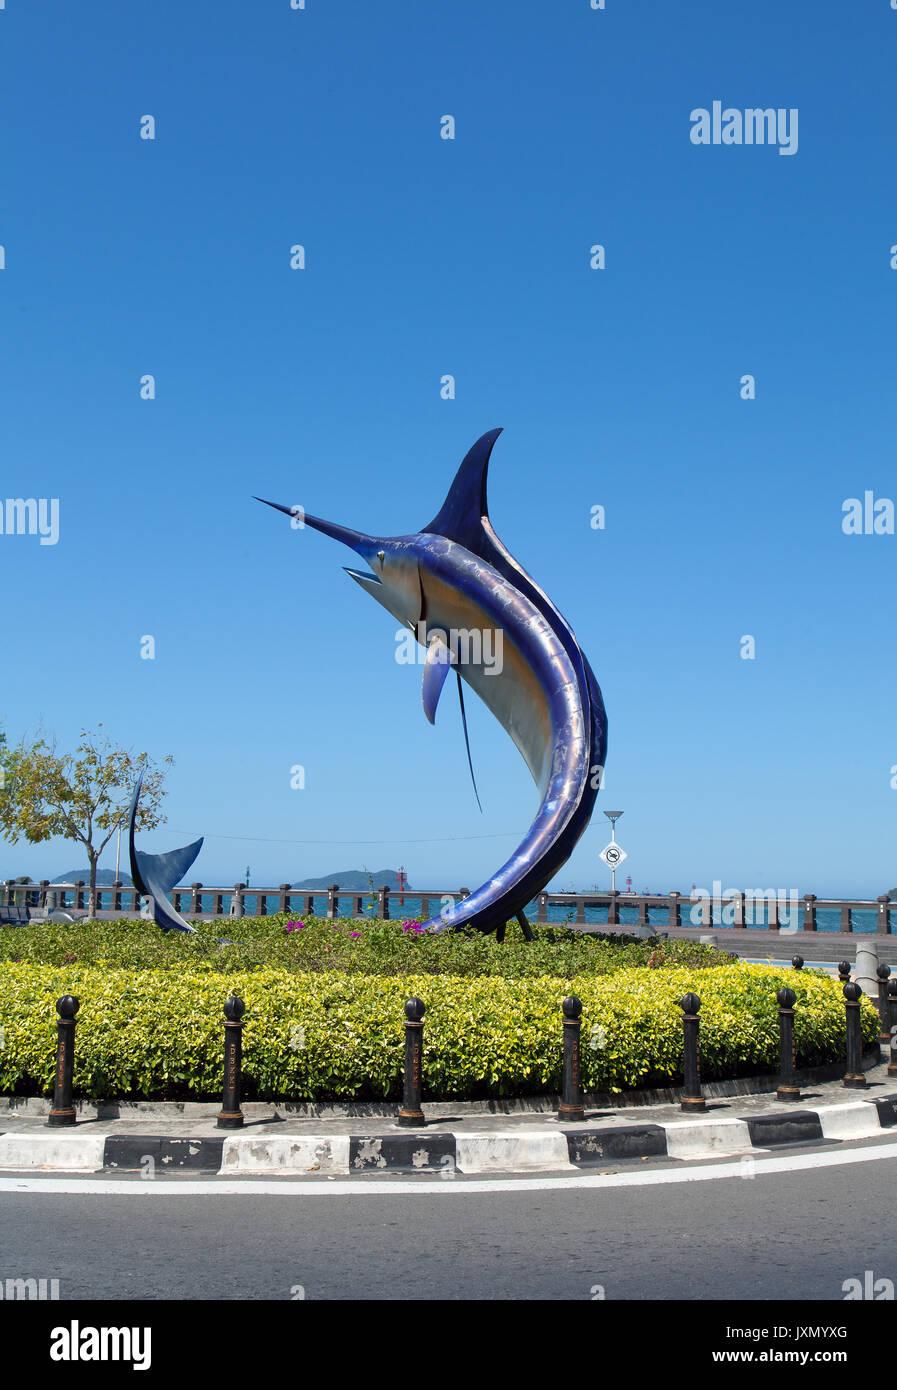 Swordfish statue located on a small roundabout, Kota Kinabalu seafront, Sabah, Borneo, Malaysia - Stock Image